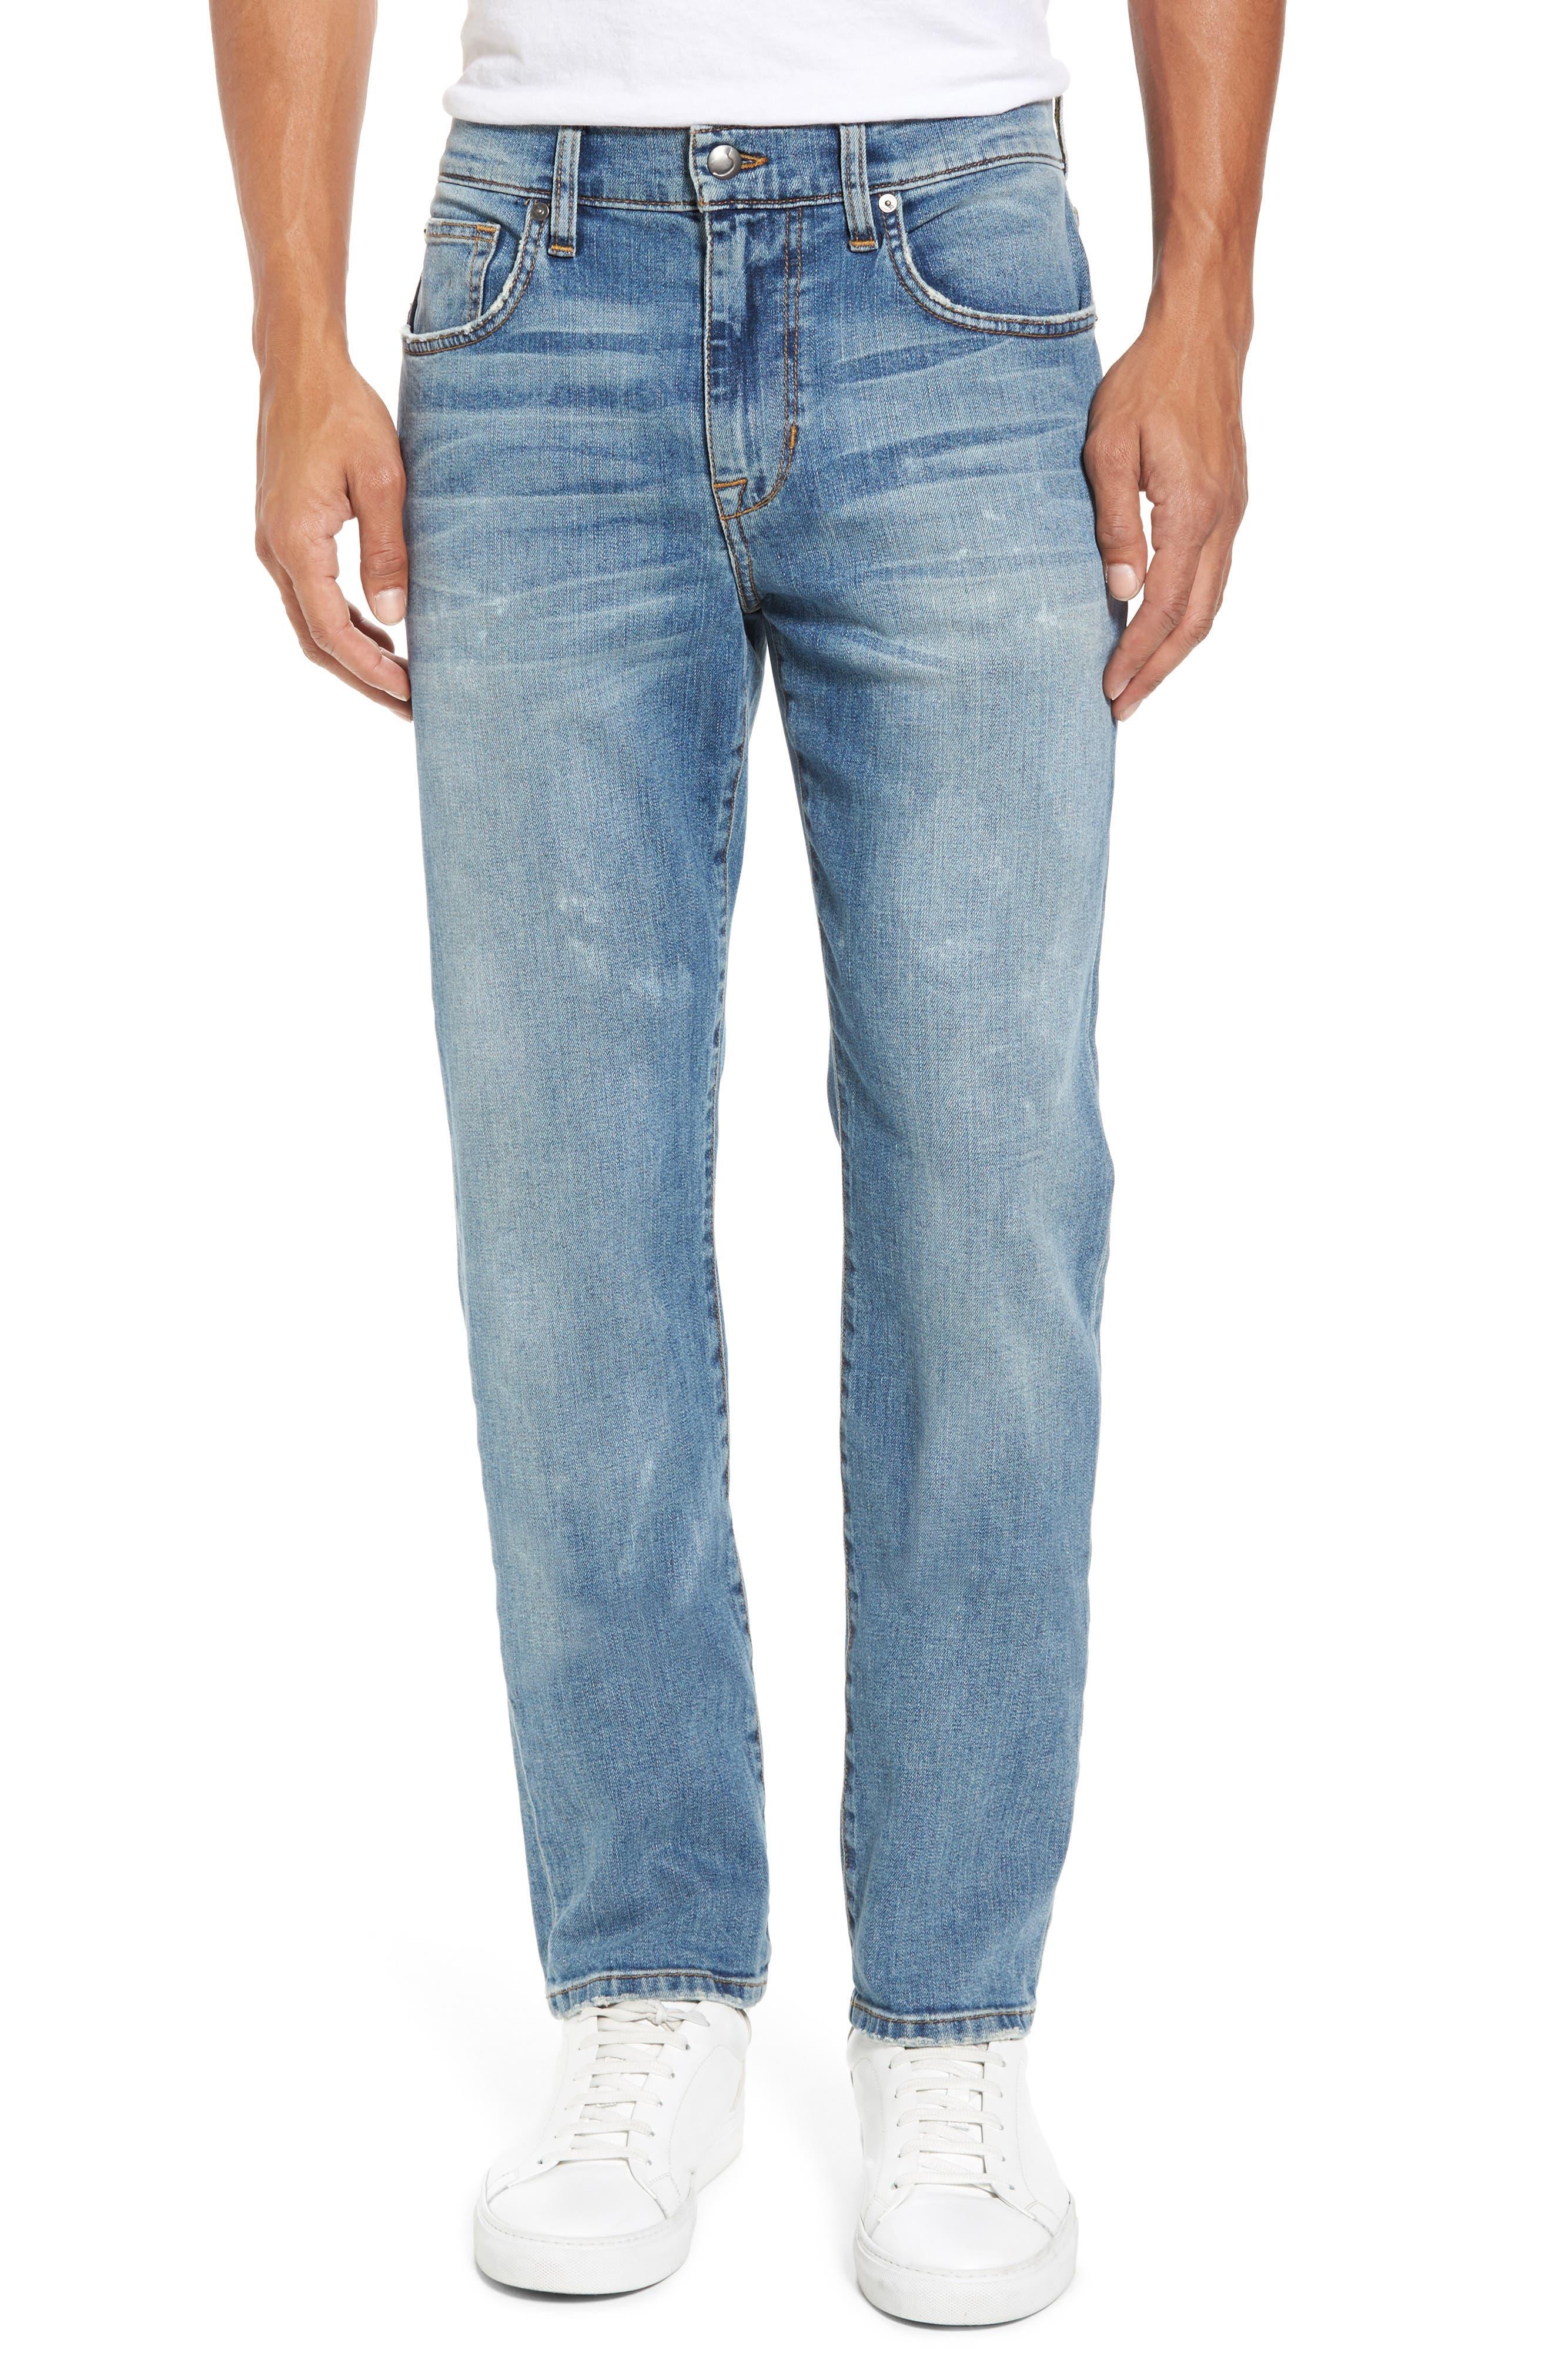 Brixton Slim Straight Fit Jeans,                         Main,                         color, 475